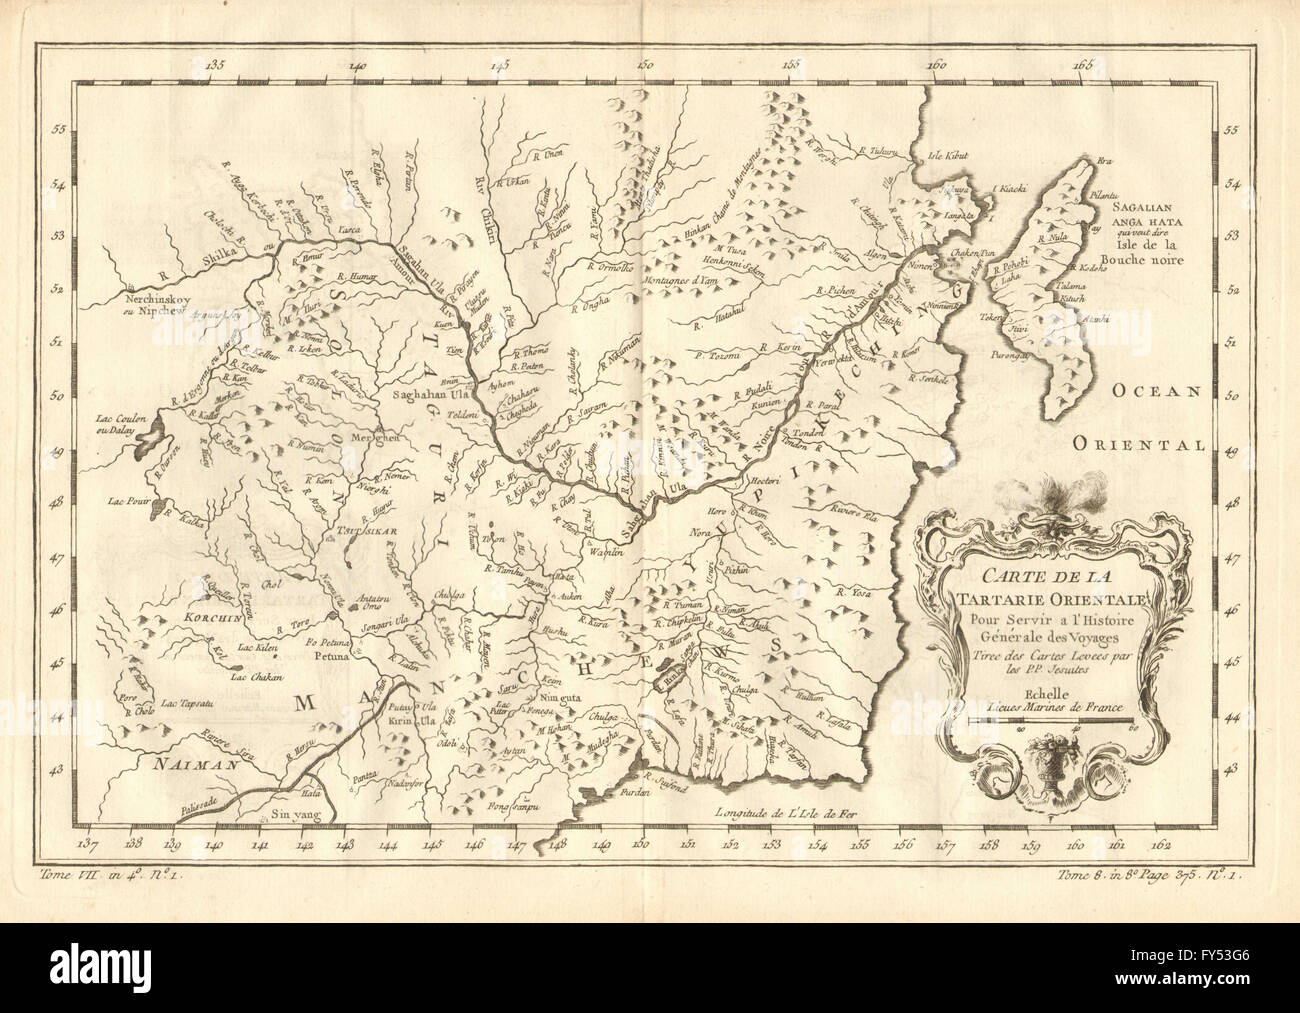 Tartarie Orientale'. Eastern Tartary. Amur River. Russia ... on gobi desert map, brahmaputra river map, caspian sea map, indus river, ganges river map, euphrates river map, kamchatka peninsula map, lake baikal, lena river, kuril islands, ganges river, amu darya, yellow river, moscow map, ob river, irrawaddy river map, mackenzie river, danube map, yalu river, yangtze river, mekong map, yenisei river map, aral sea map, yangtze river map, himalayas map, bering sea map, yenisei river, don river map, xi jiang river map, chang jiang river map, russia map, amu darya river map, ural river, kamchatka peninsula, brahmaputra river,